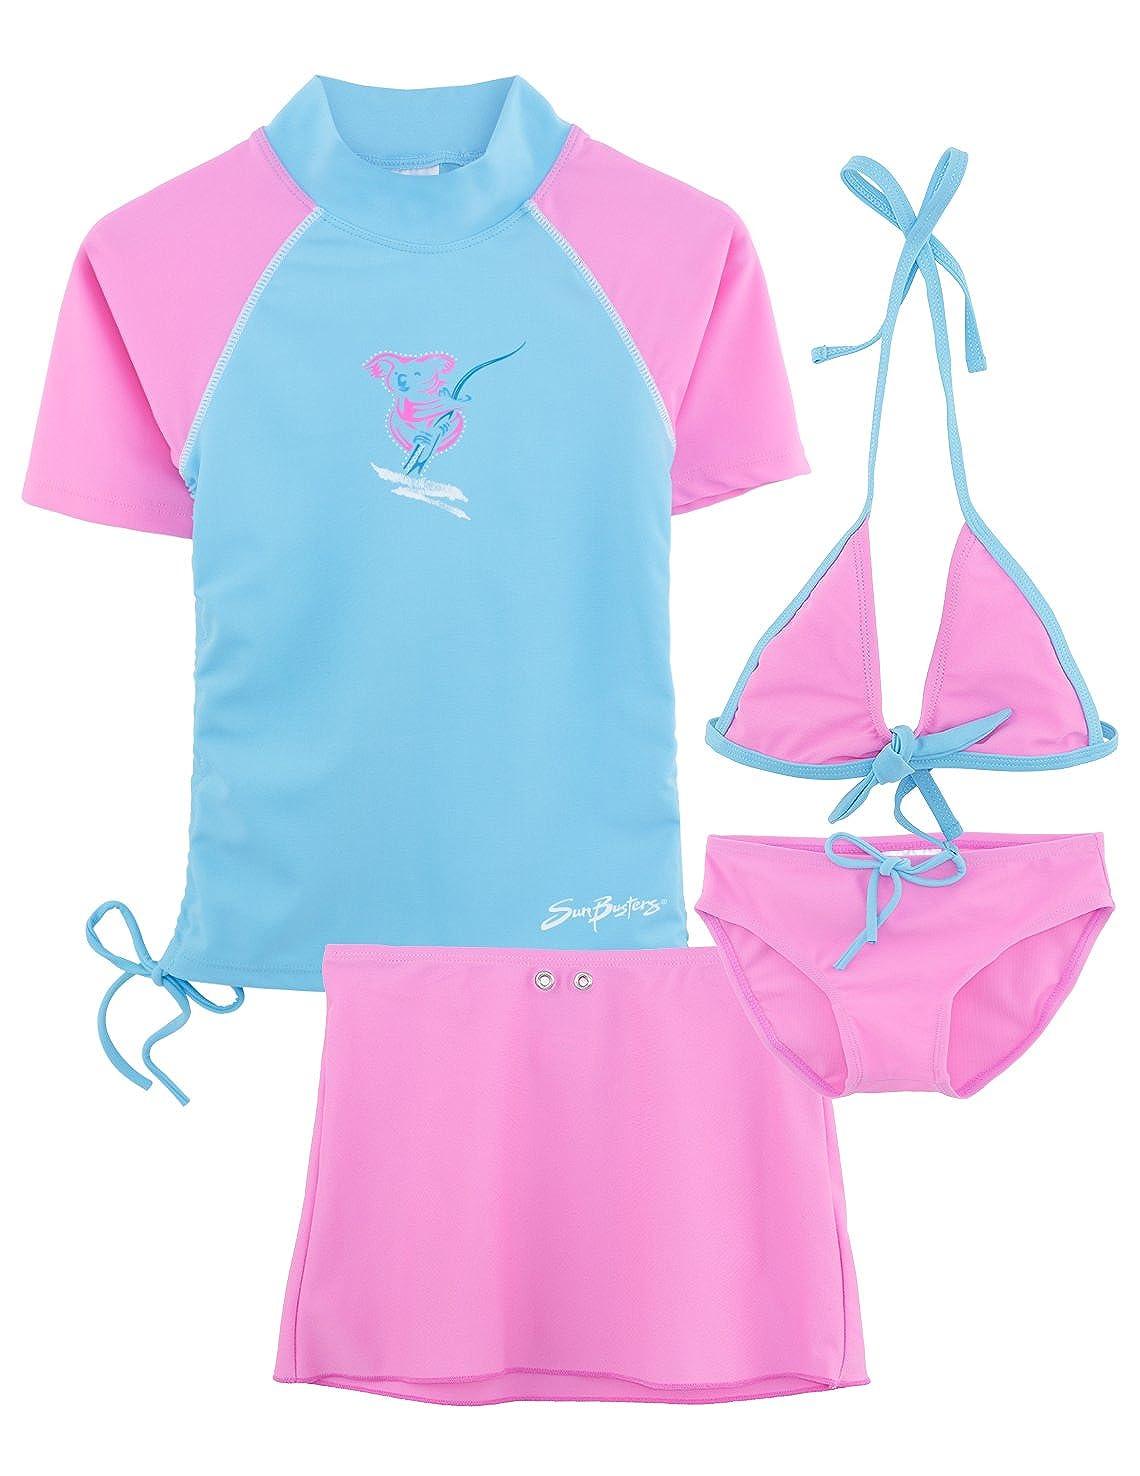 SunBusters Girls Ruched Swim Set 12 mos-12 yrs, UPF 50+ Sun Protection Plangea